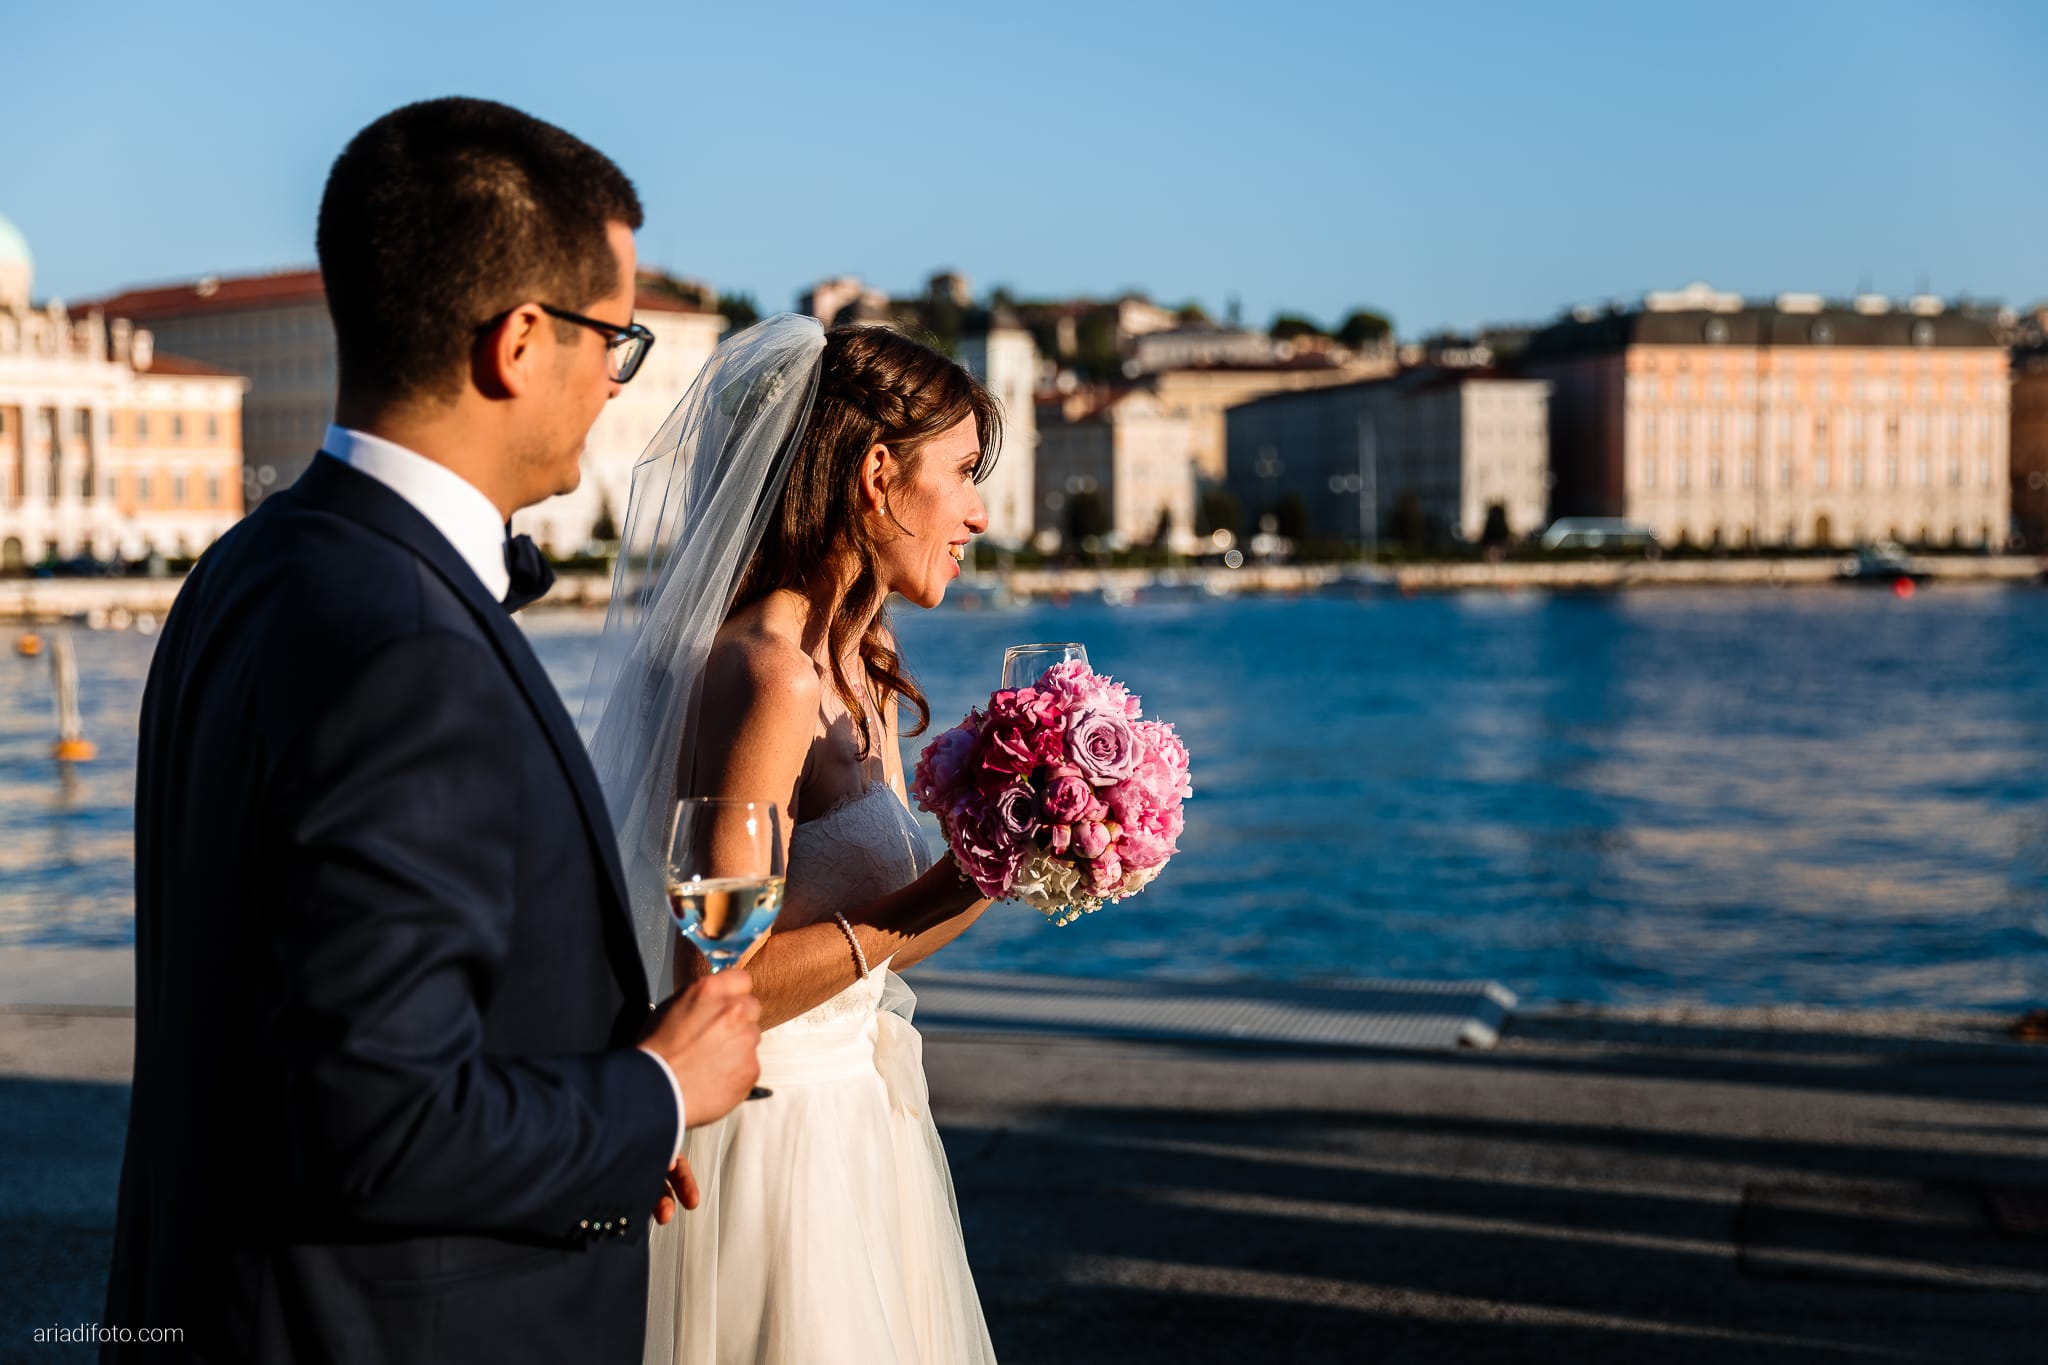 Marina Stefano Matrimonio Castello San Giusto Molo IV Trieste ricevimento buffet